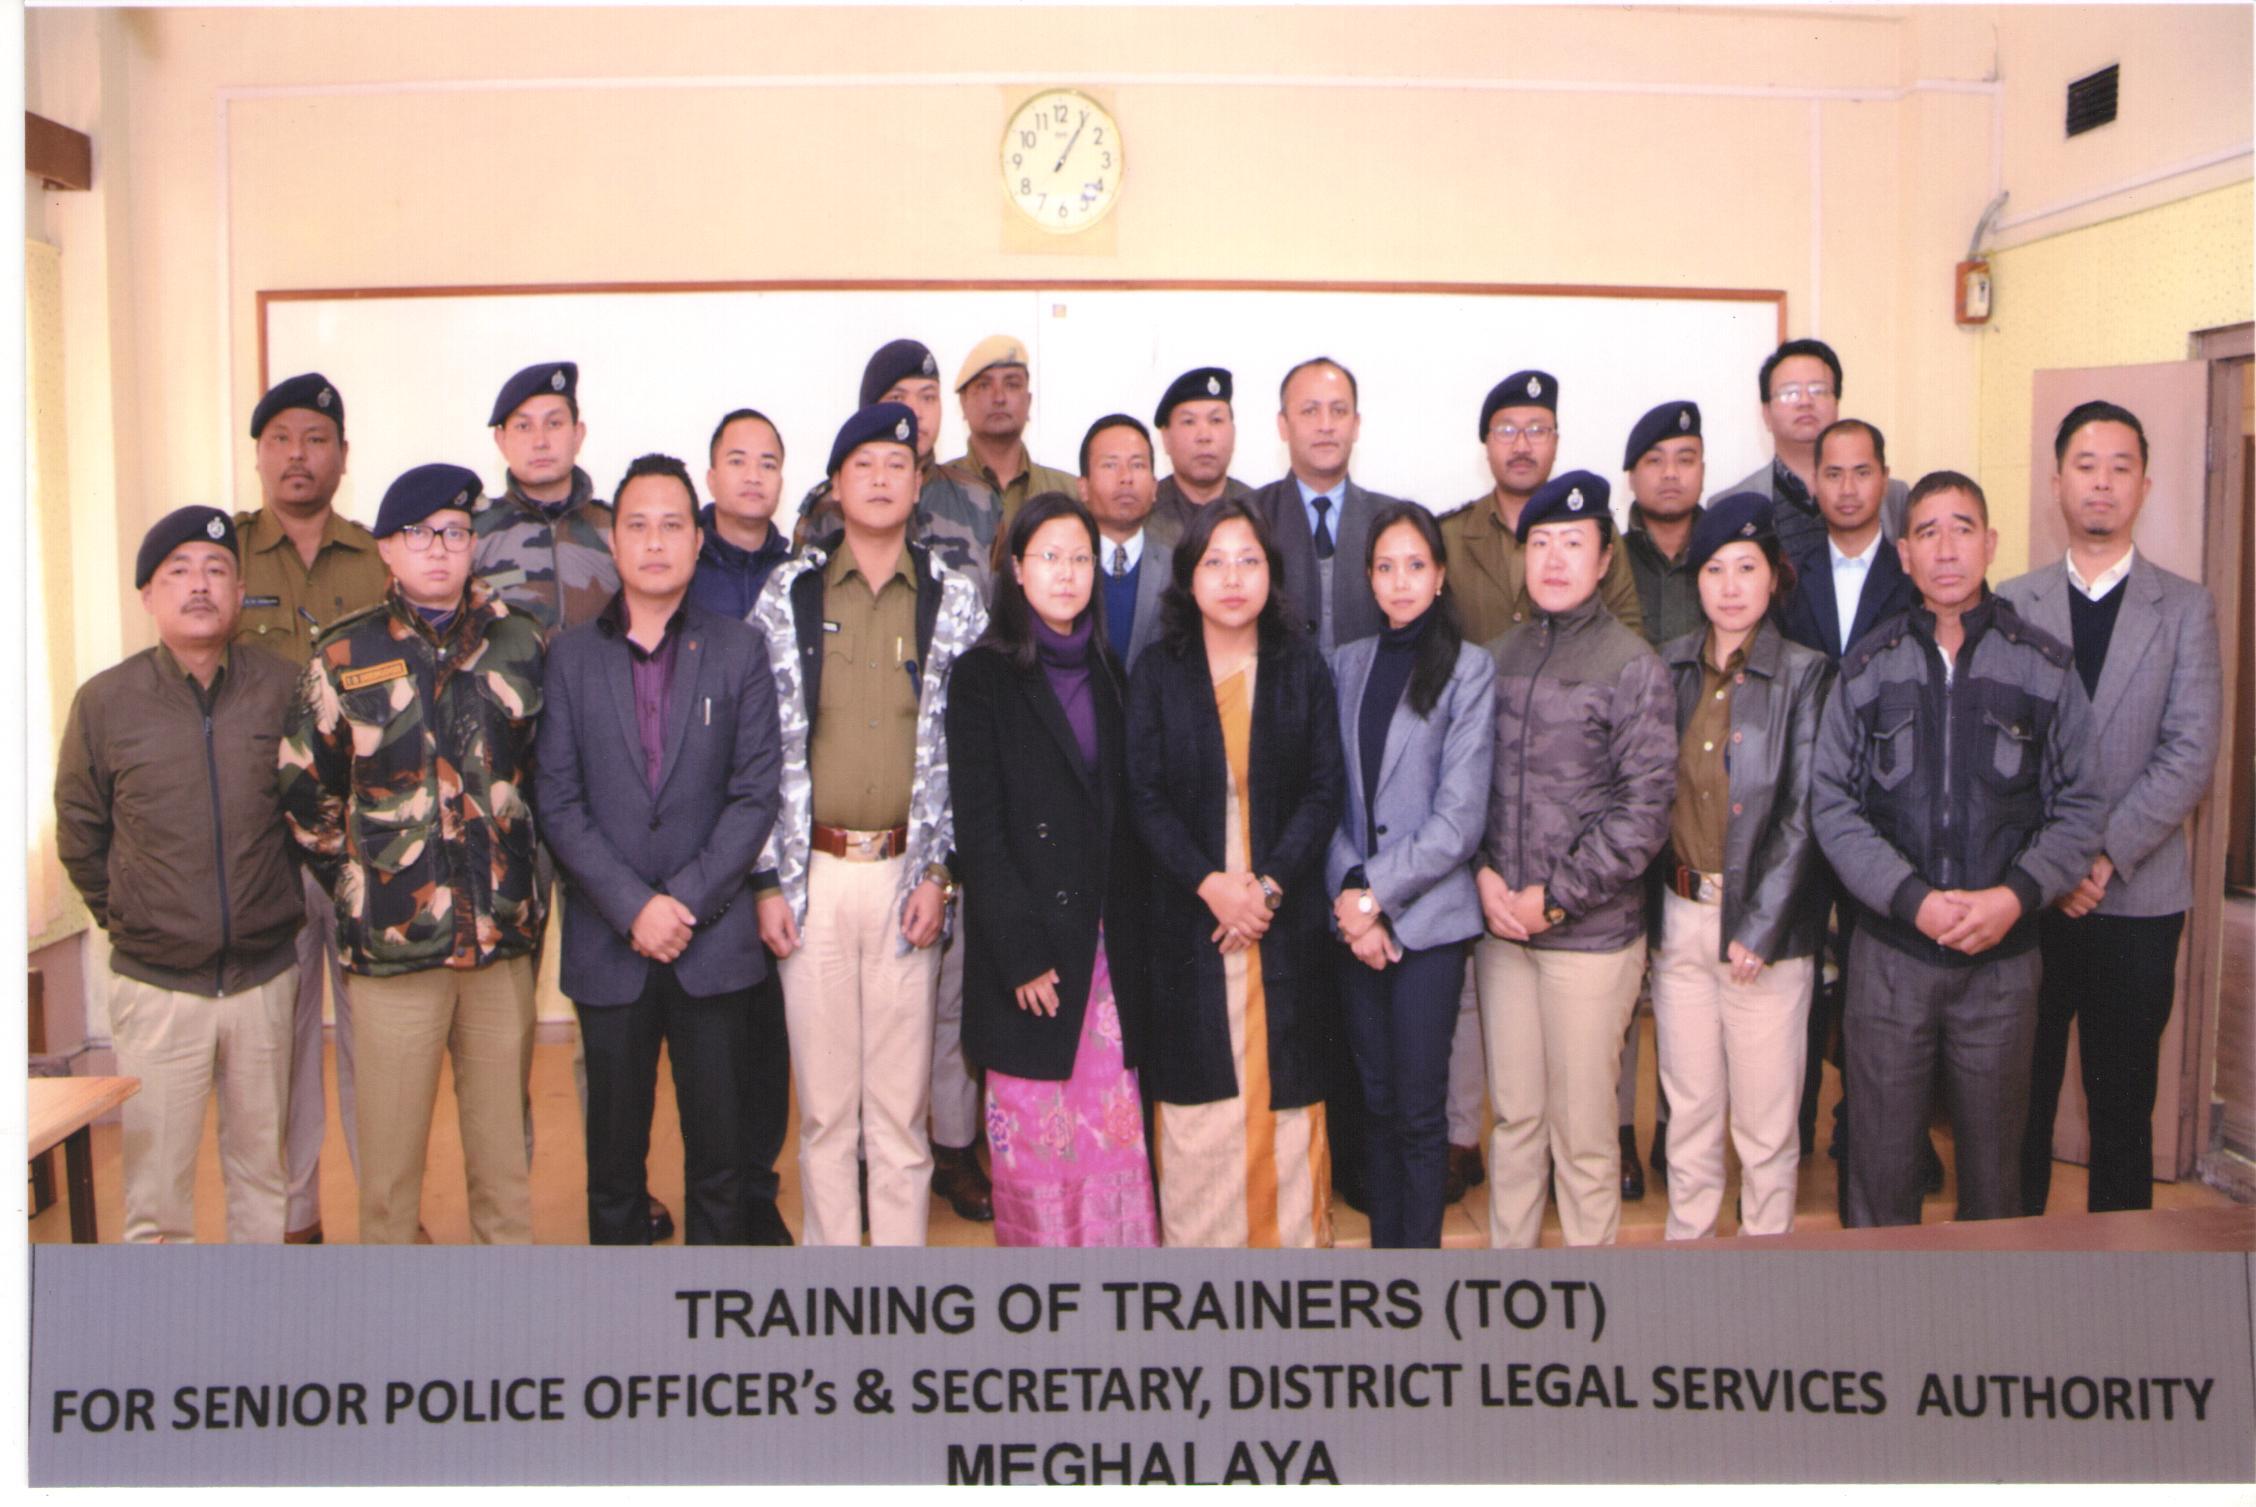 TRAINING OF TRAINERS (TOT) FOR SENIOR POLICE OFFICER'S & SECRETARY, DLSA